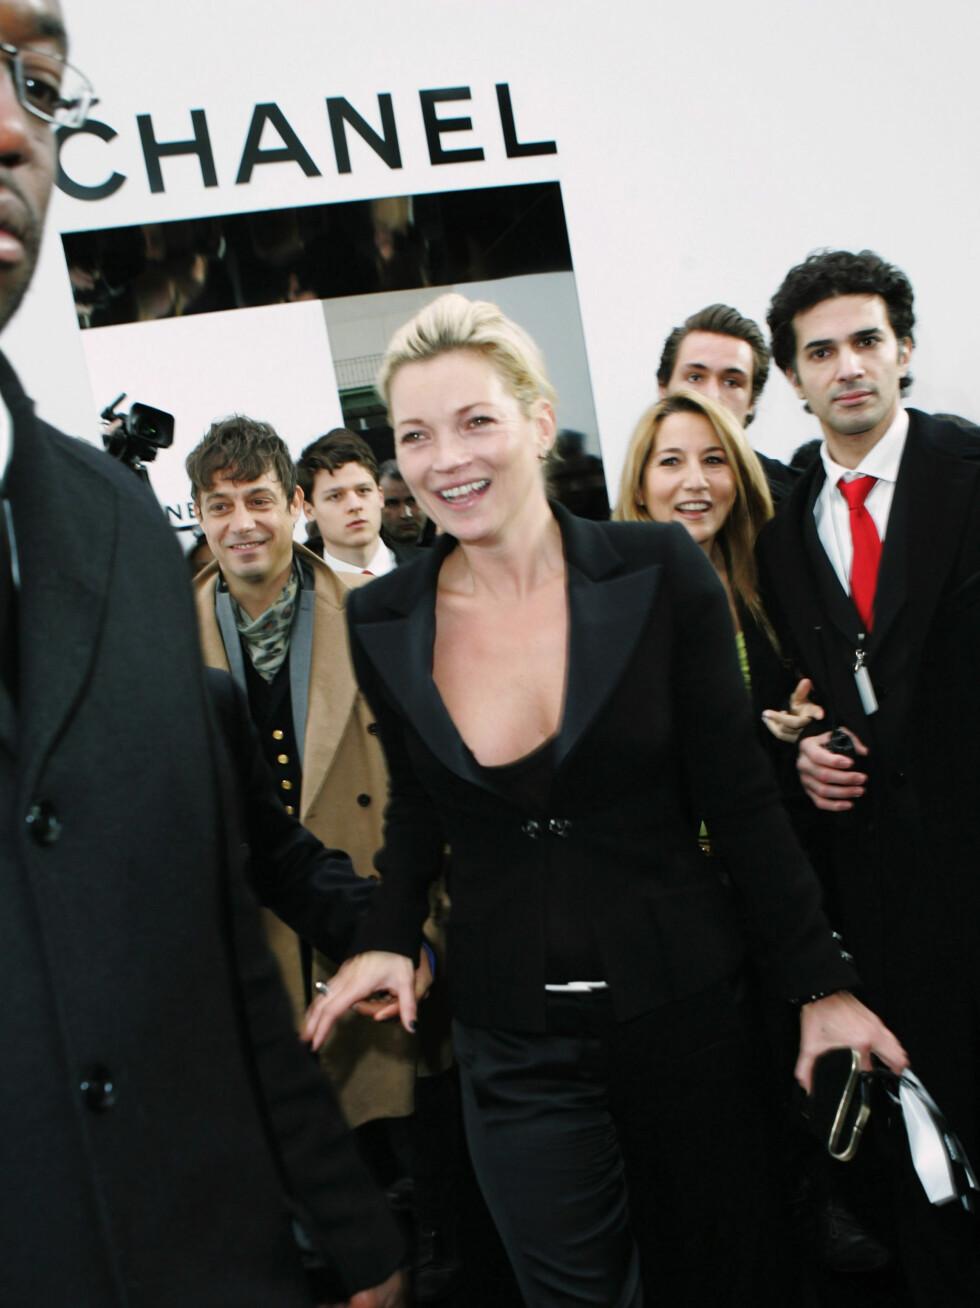 ET STORT SMIL: Kate Moss stilte i svart stilren klassisk dress på Chanels visning på Grand Palais i Paris. Foto: All Over Press